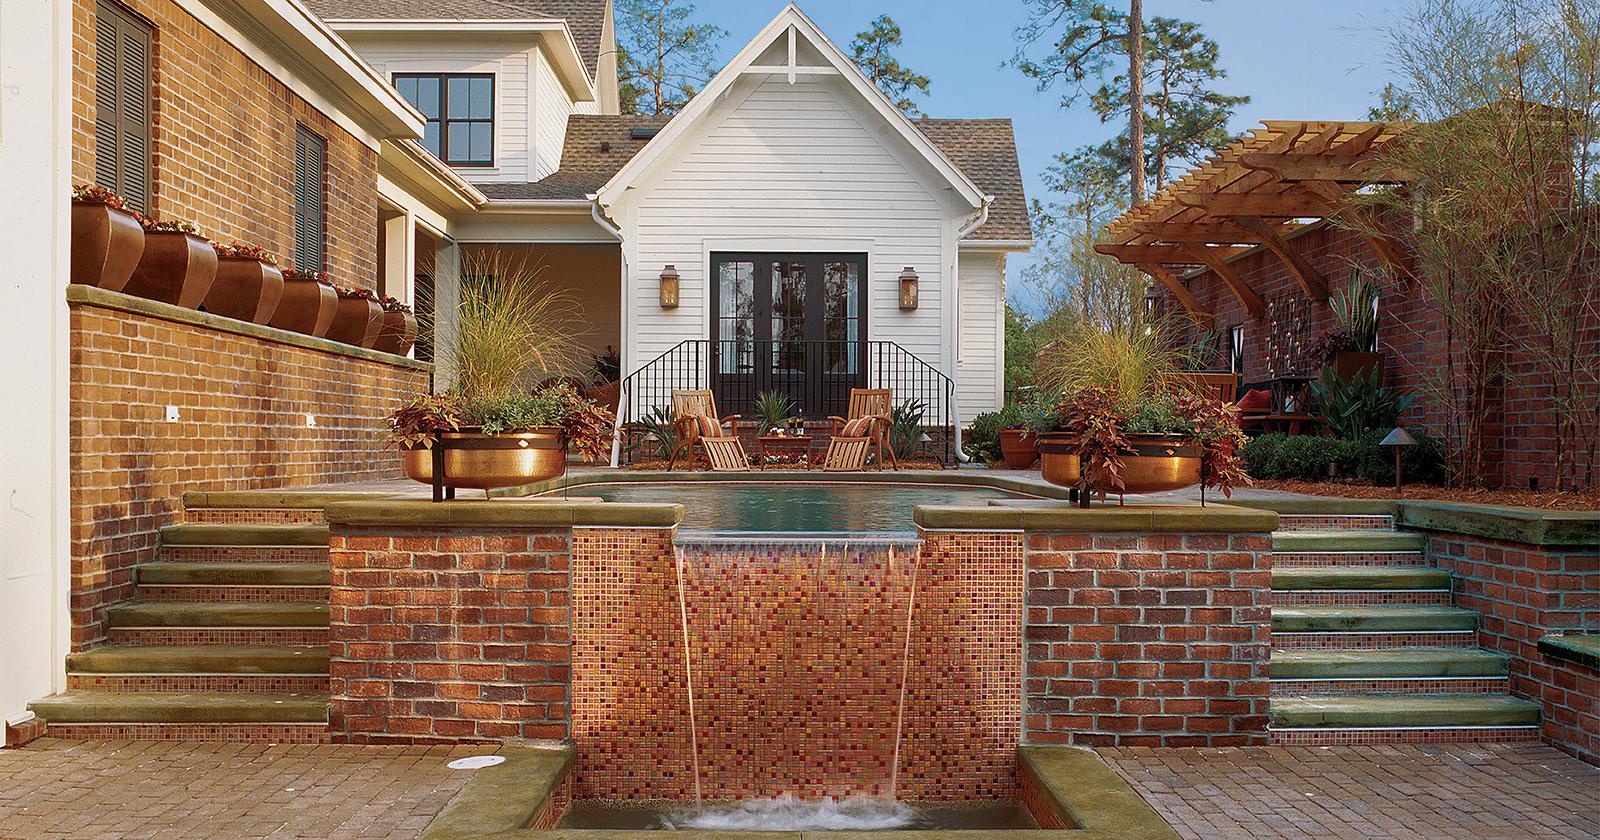 Southern Living Idea House, Kinsley Place, DeLand, FL